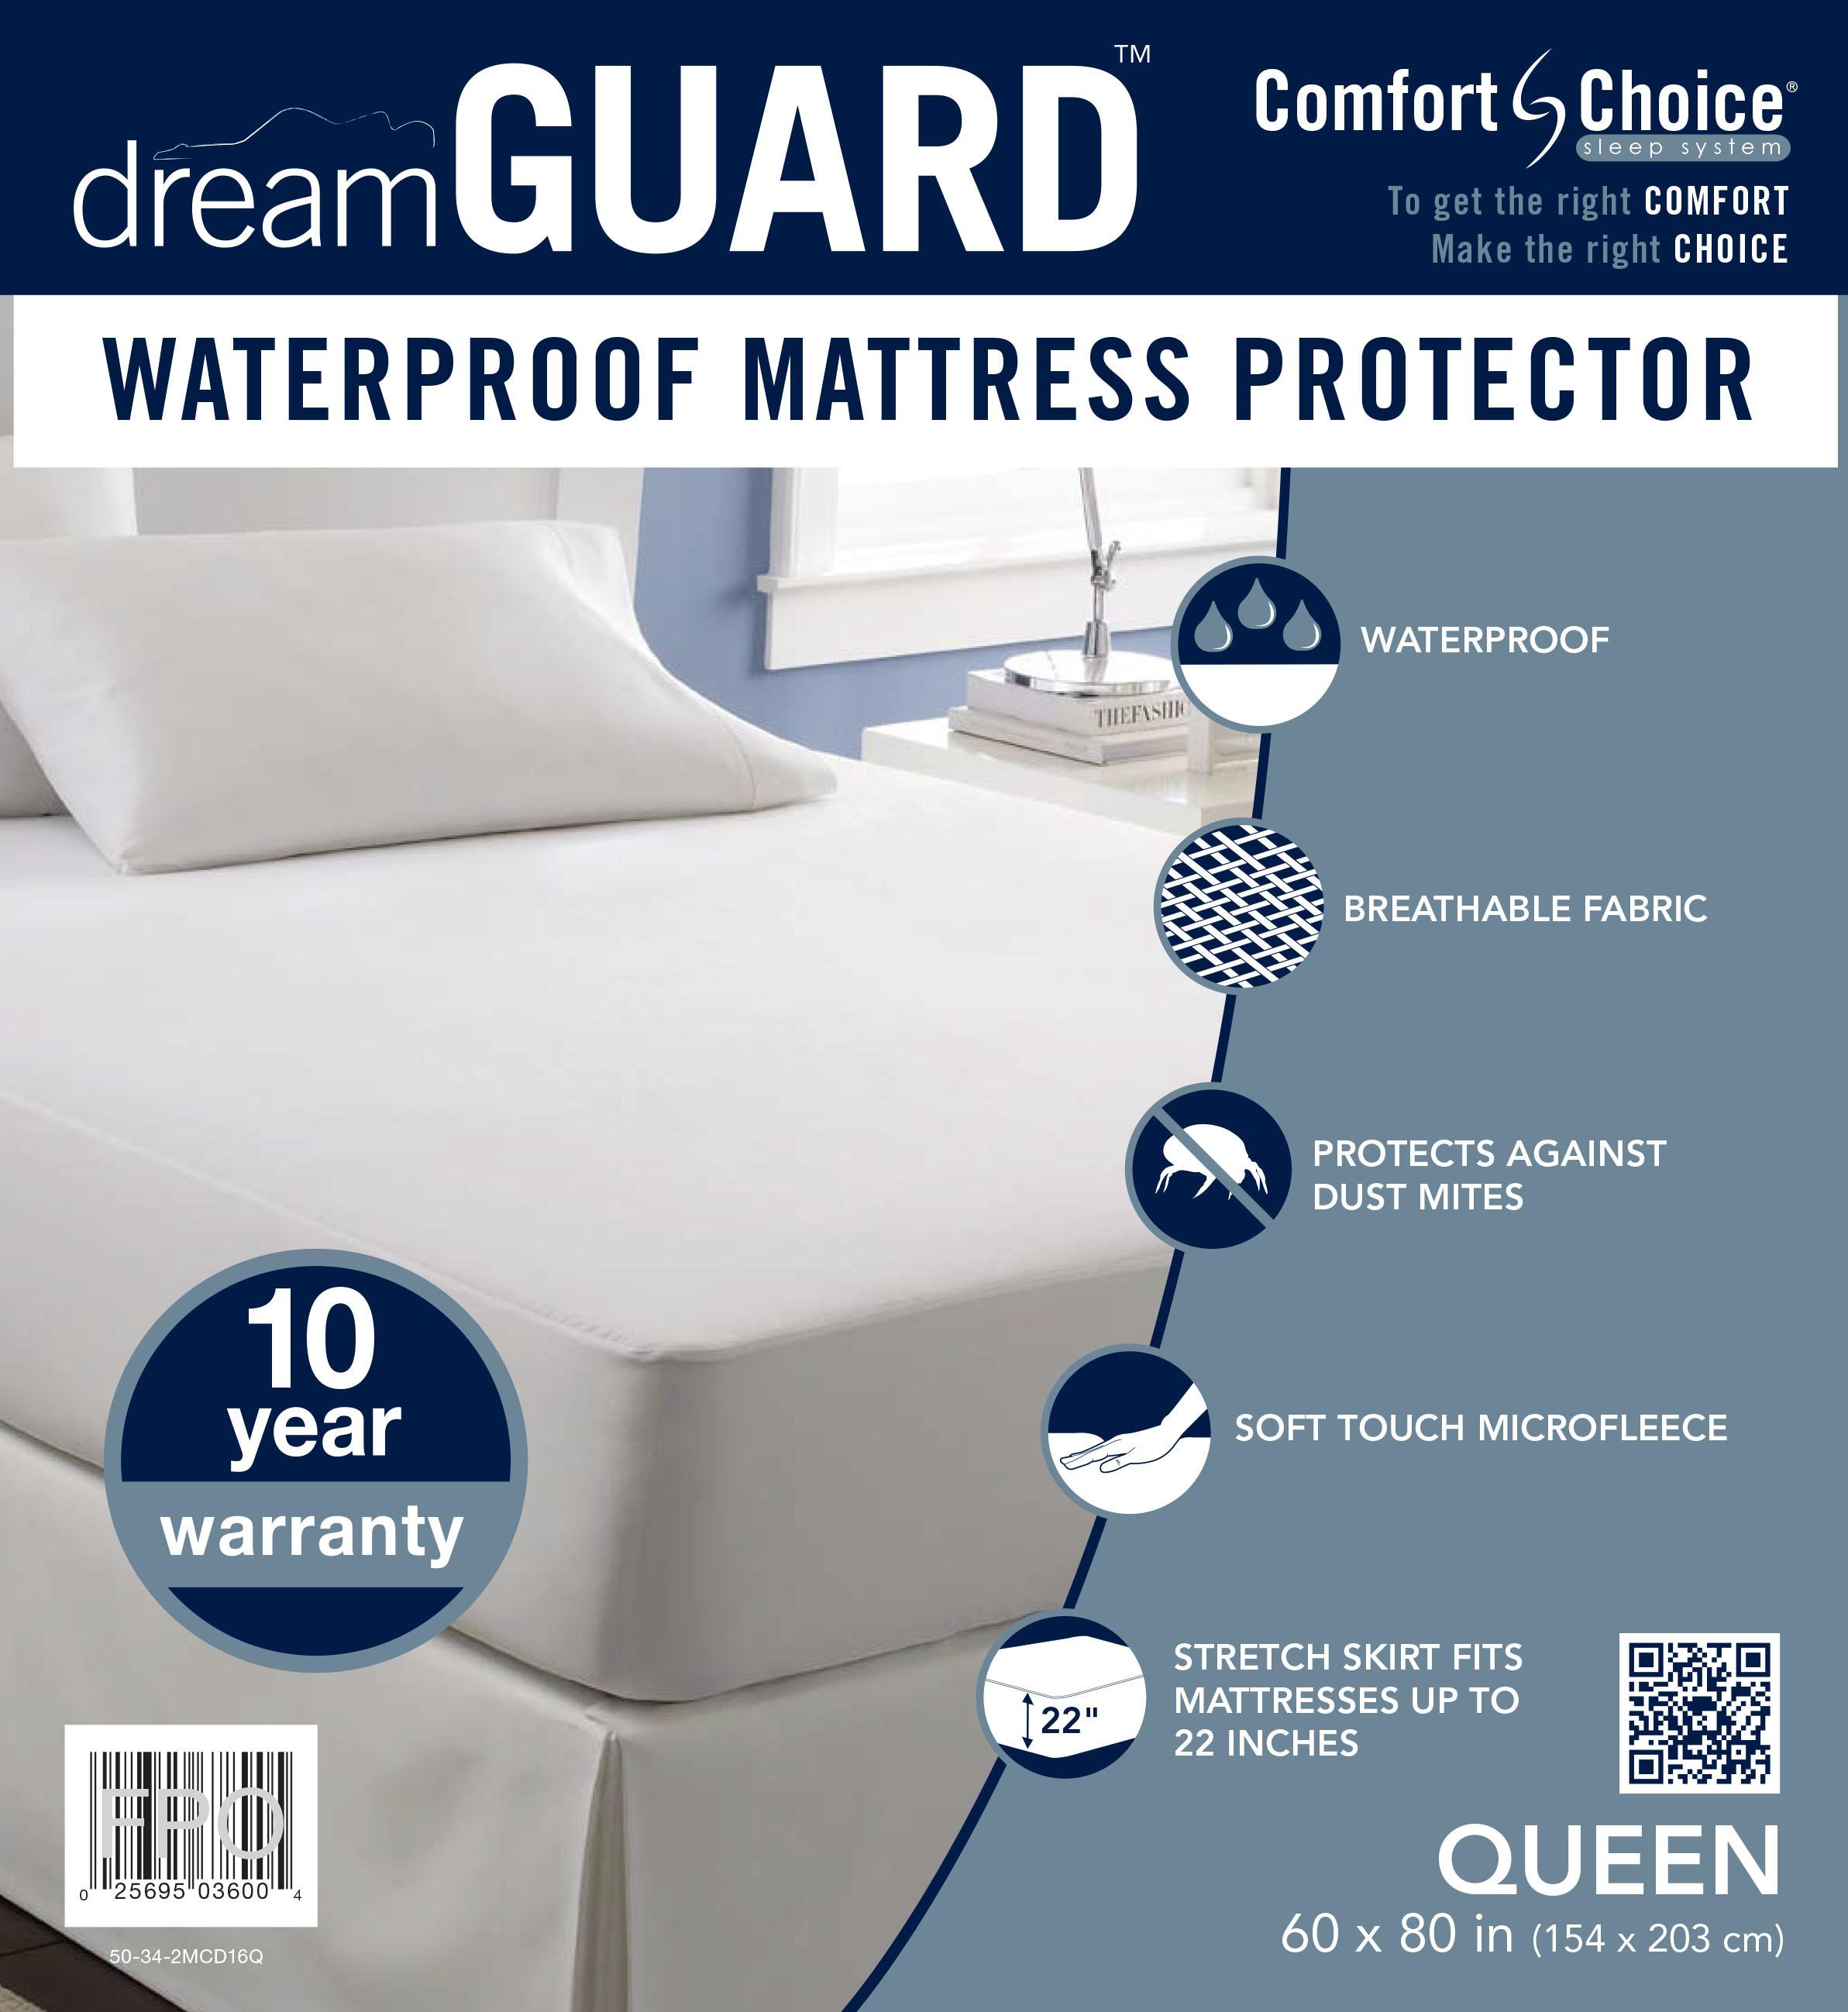 dreamGUARD Queen Size Mattress Protector